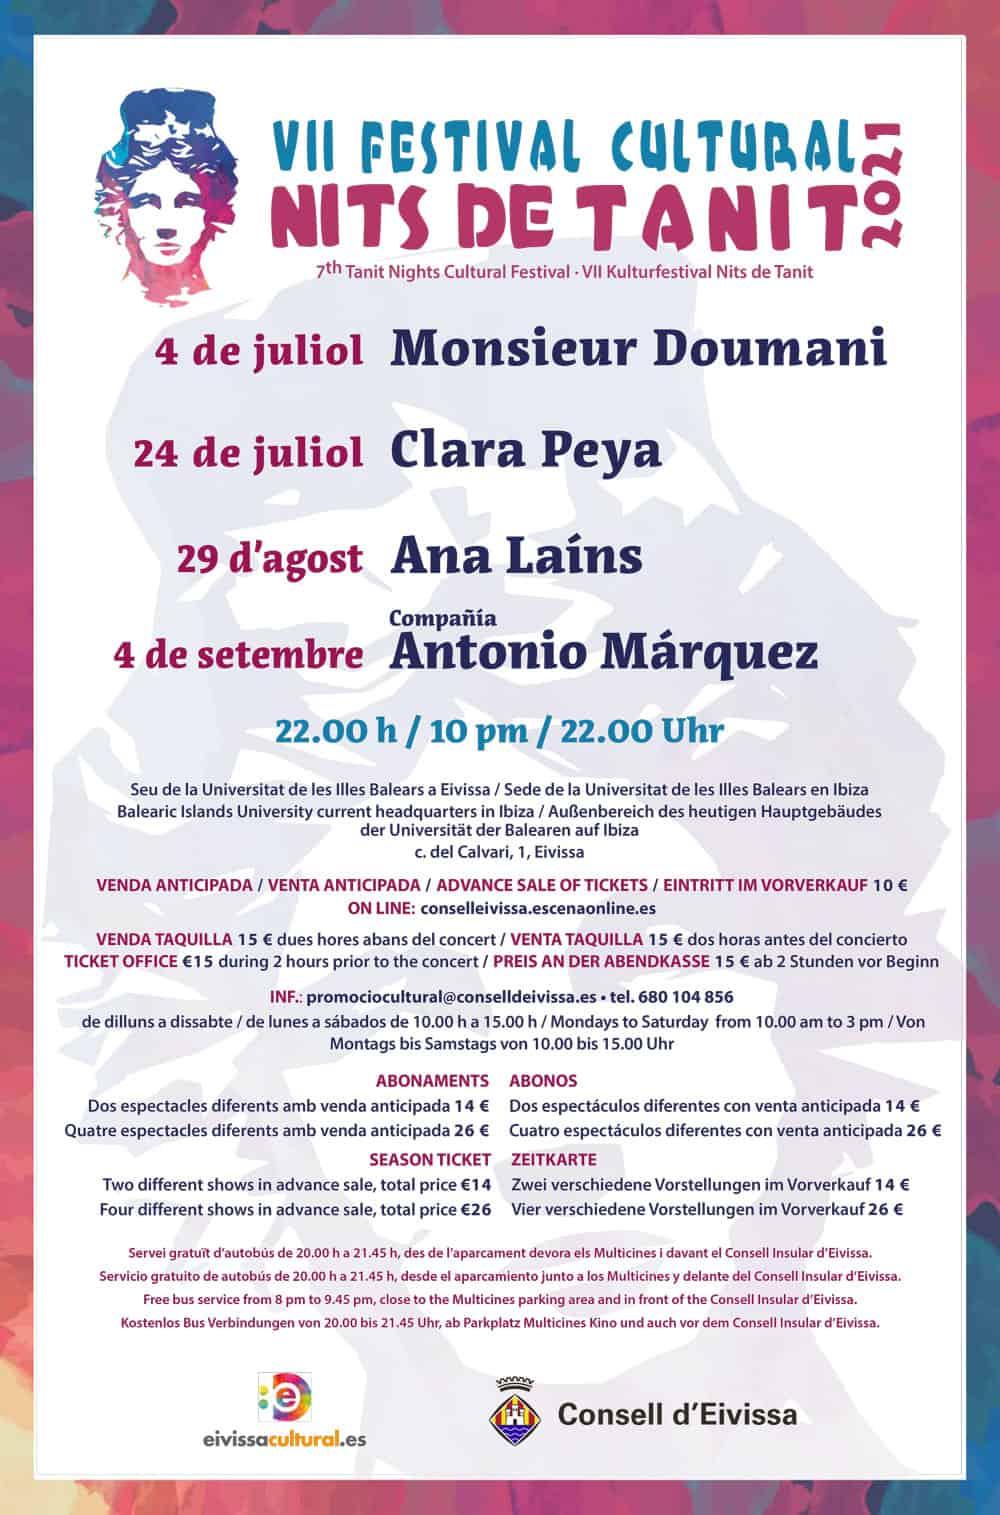 programma-vii-festival-nits-de-tanit-ibiza-2021-welcometoibiza